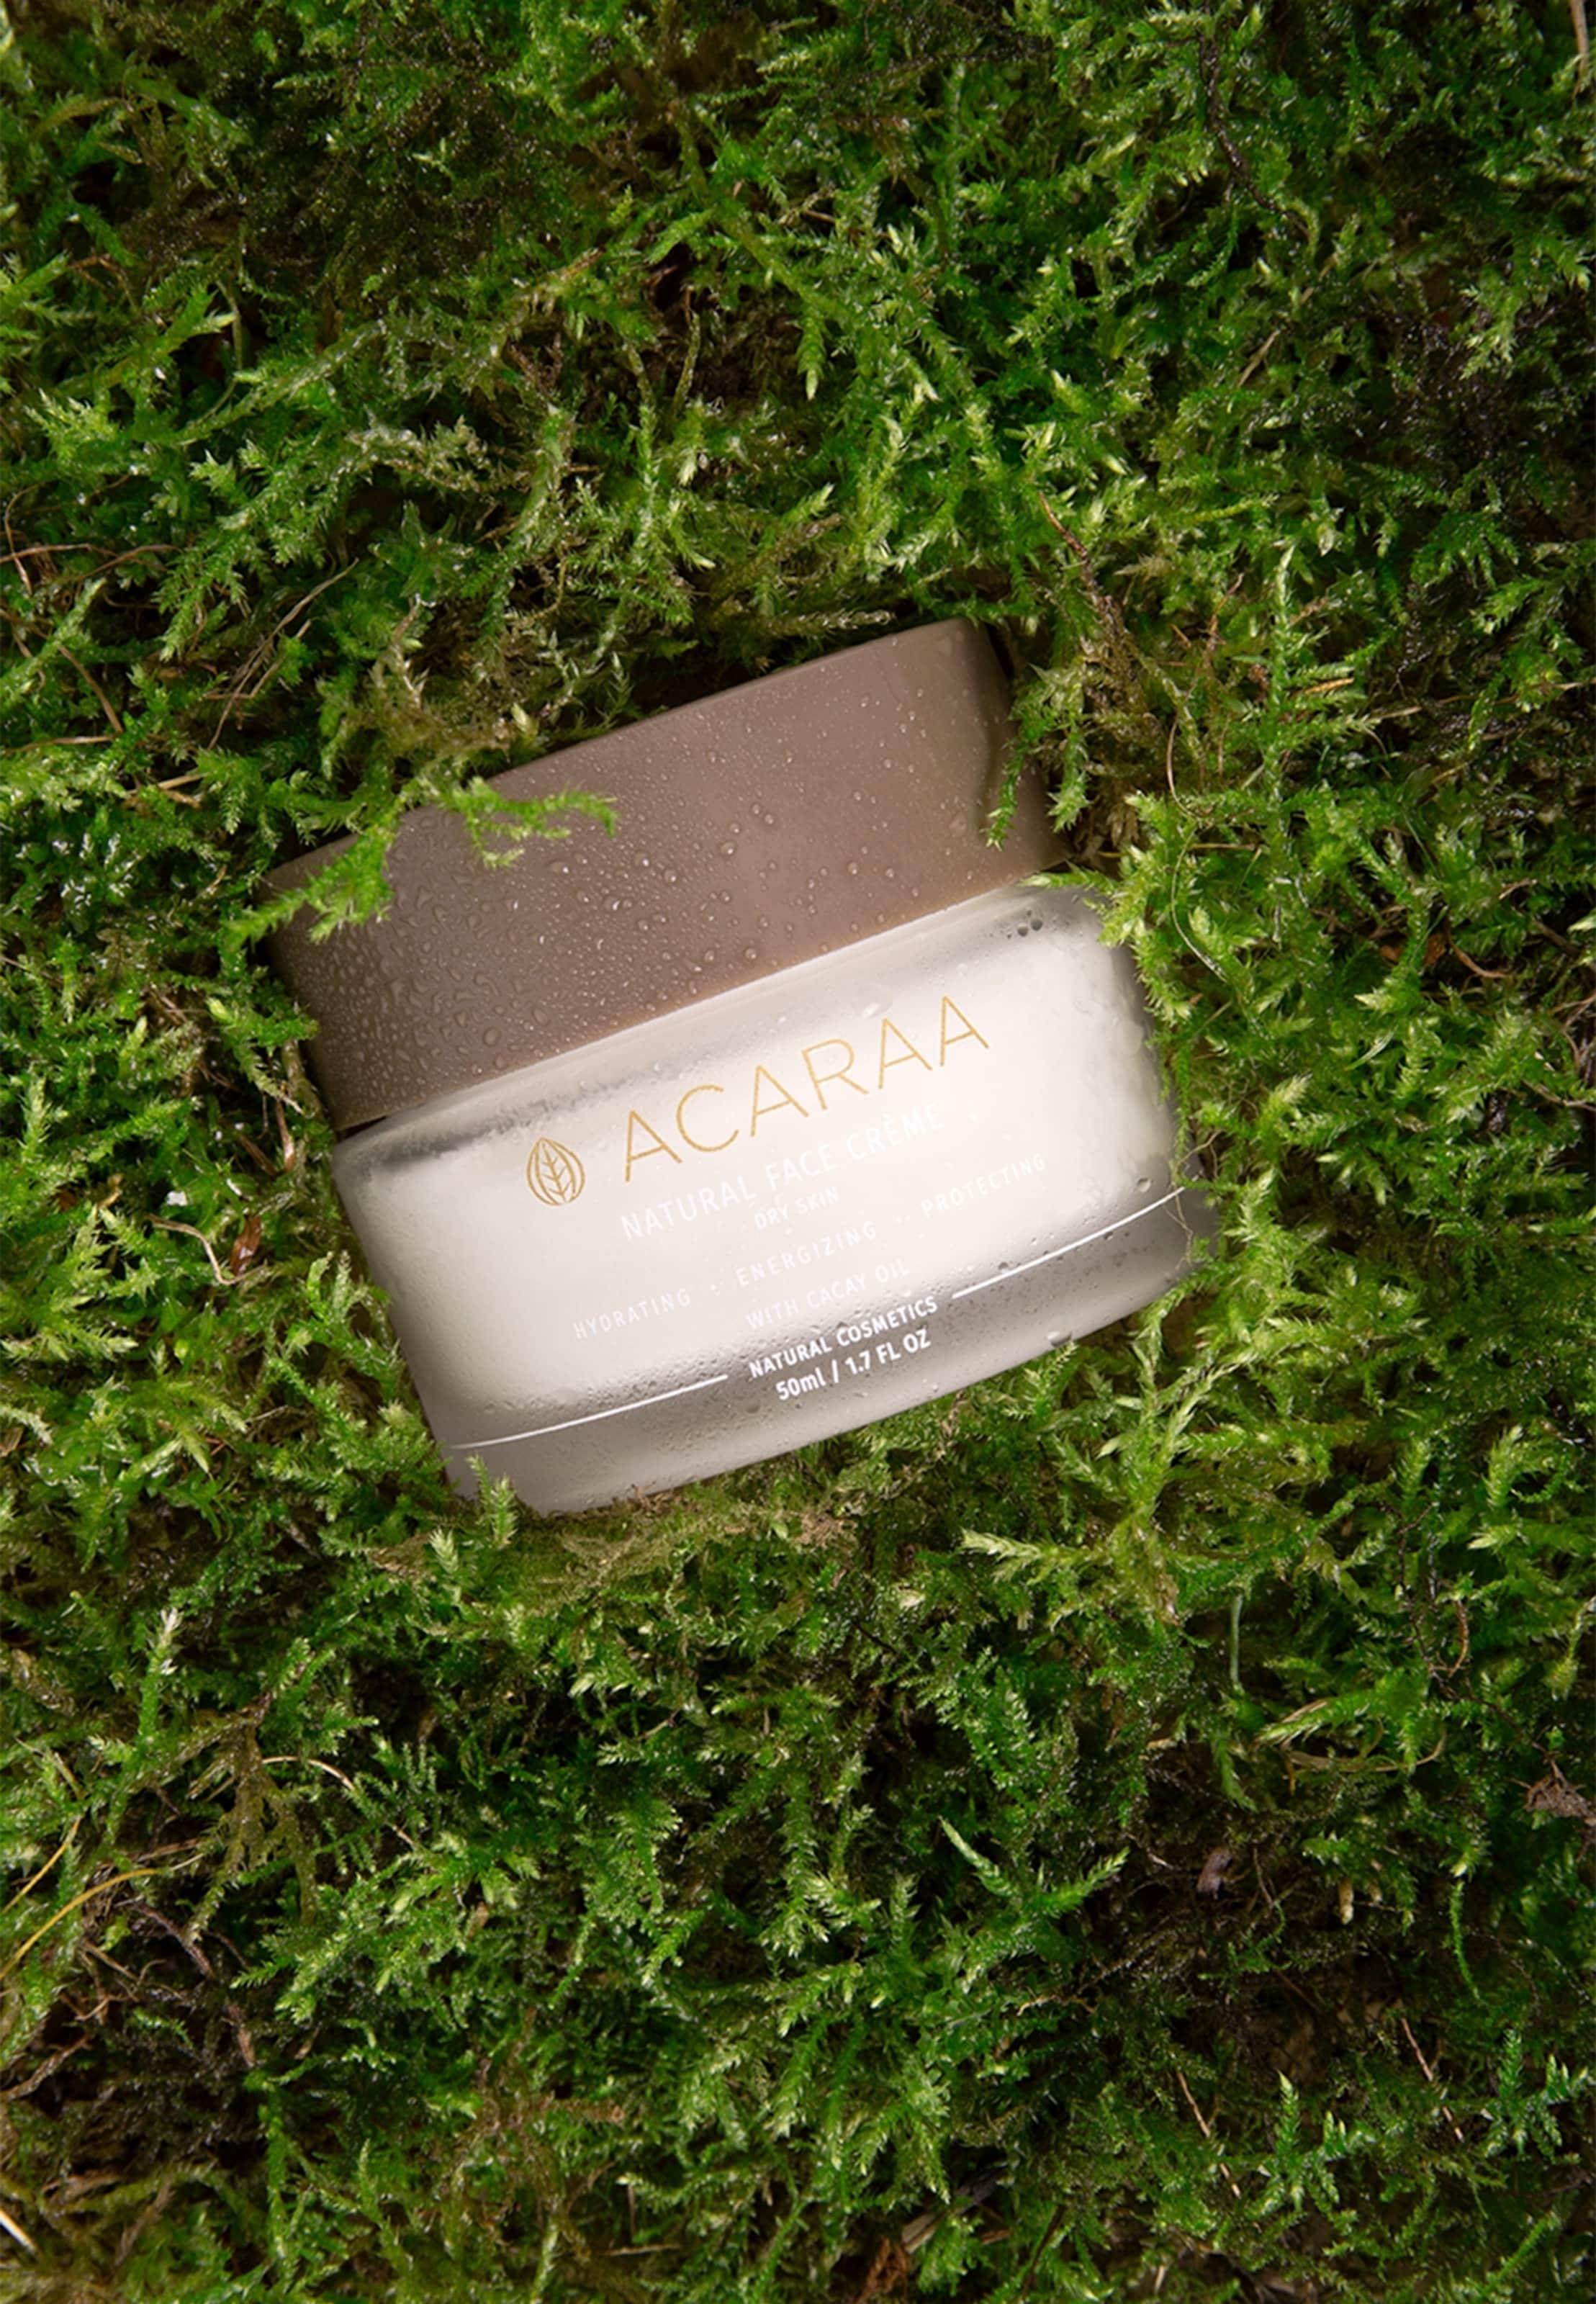 Naturkosmetik Acaraa Face Skin Cream In Gesichtscreme Natural 50ml Weiß Dry FJTl1Kc